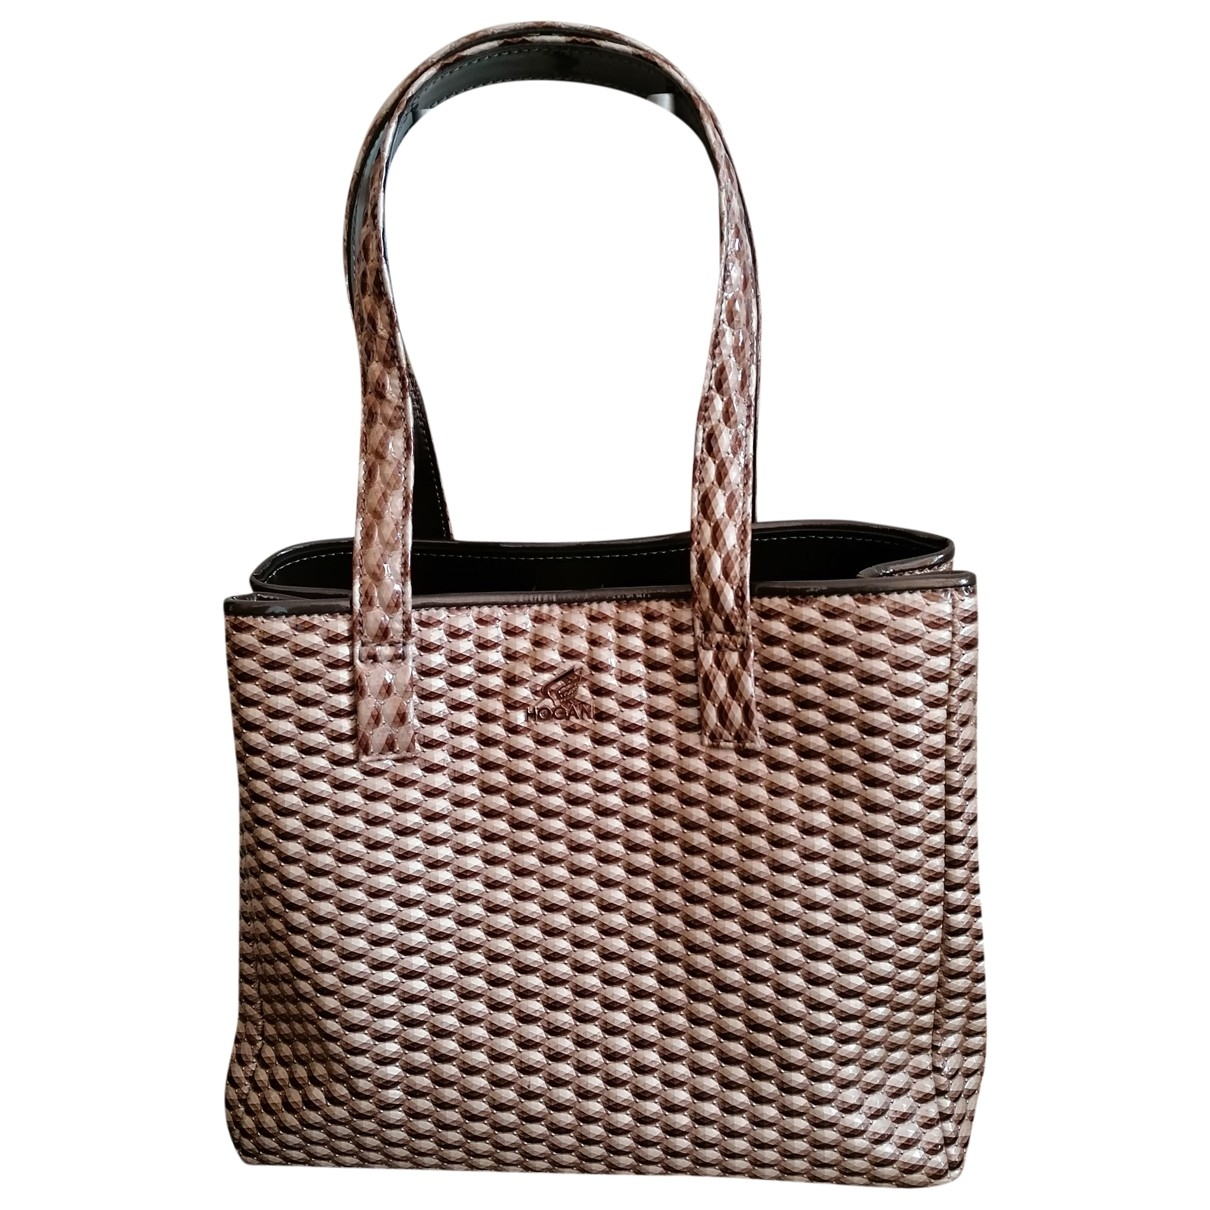 Hogan \N Handtasche in  Ecru Synthetik